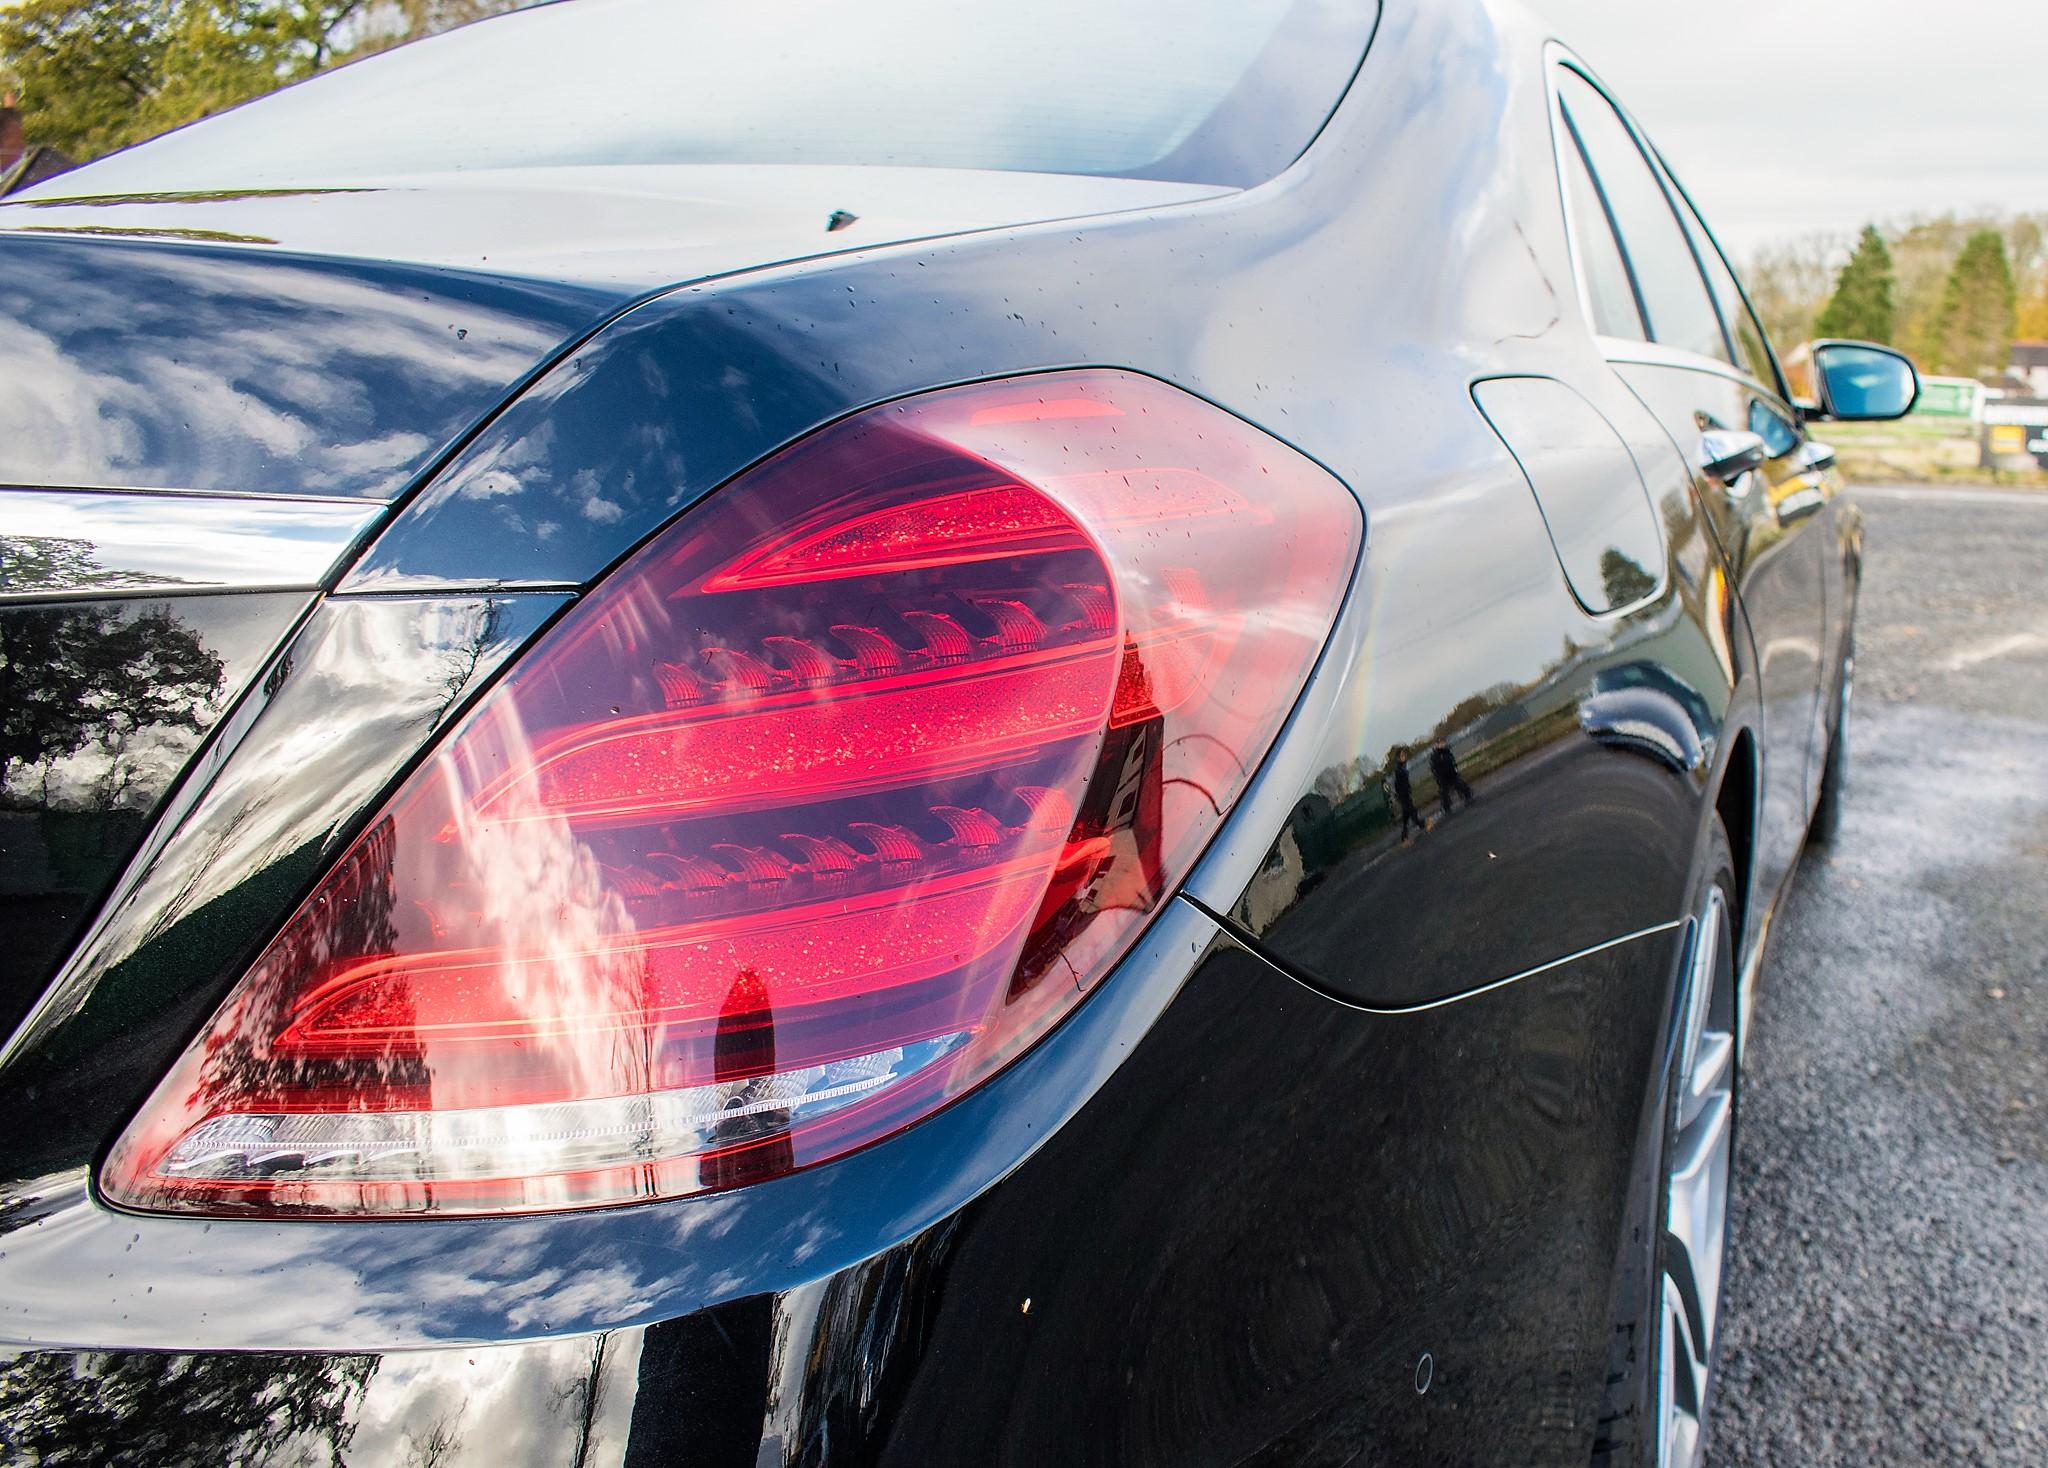 Mercedes Benz S450 L AMG Line Executive auto petrol 4 door saloon car Registration Number: FX68 - Image 10 of 30